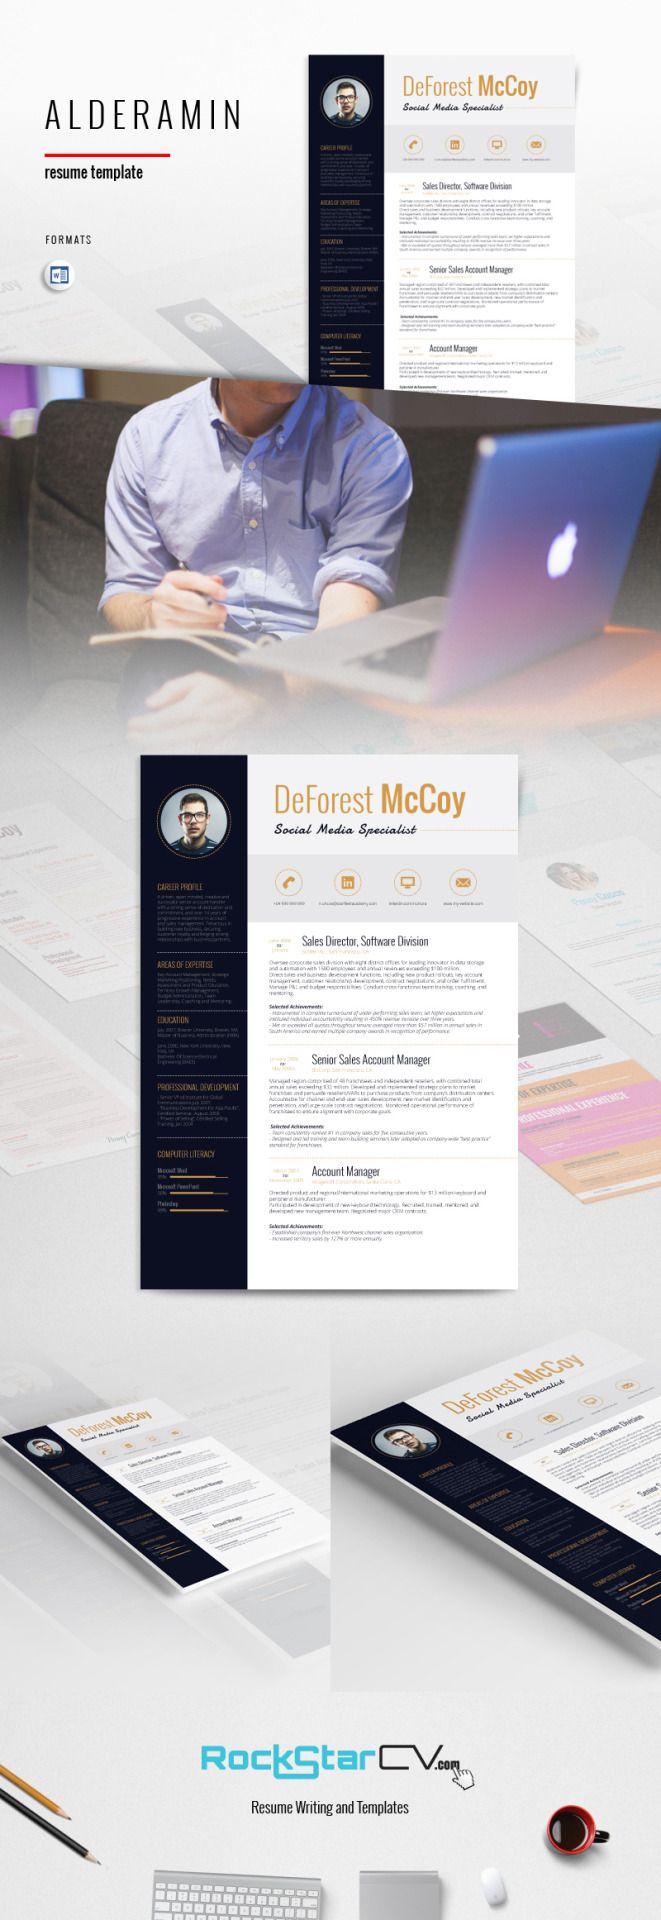 Creative Resume Templates http://rockstarcv.com/editable-resume ...